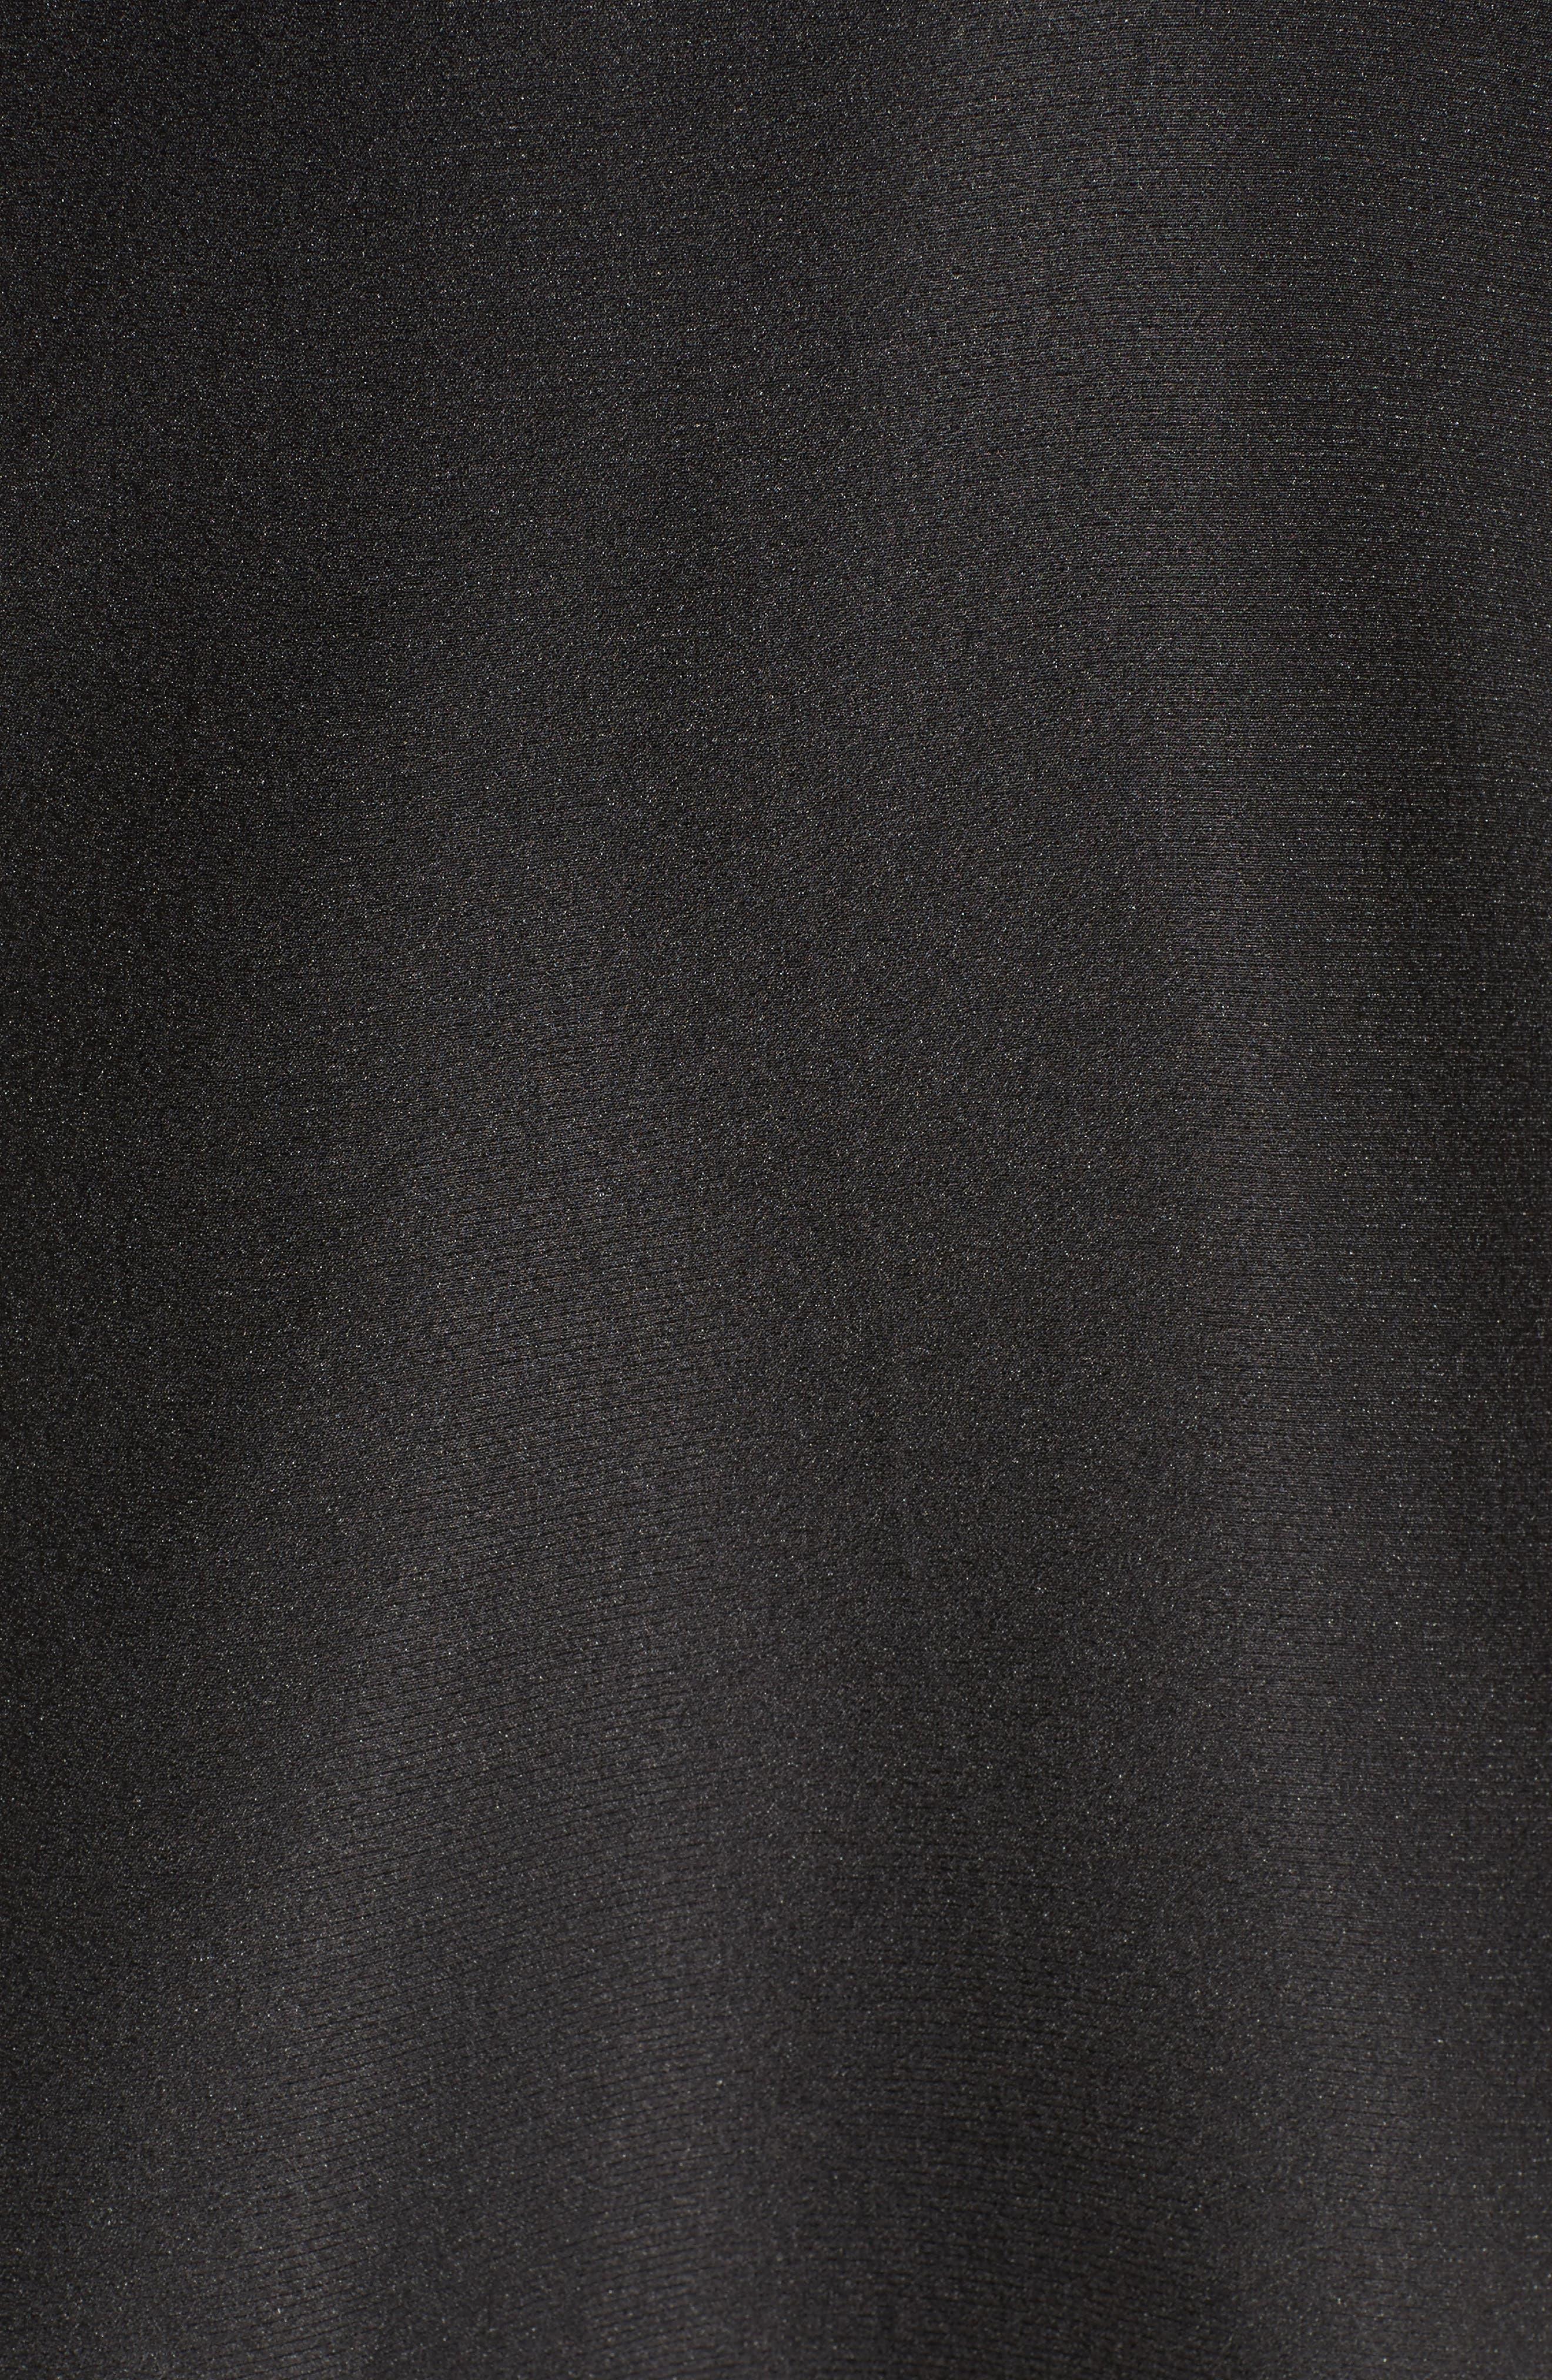 Call Me Strapless Dress,                             Alternate thumbnail 6, color,                             001